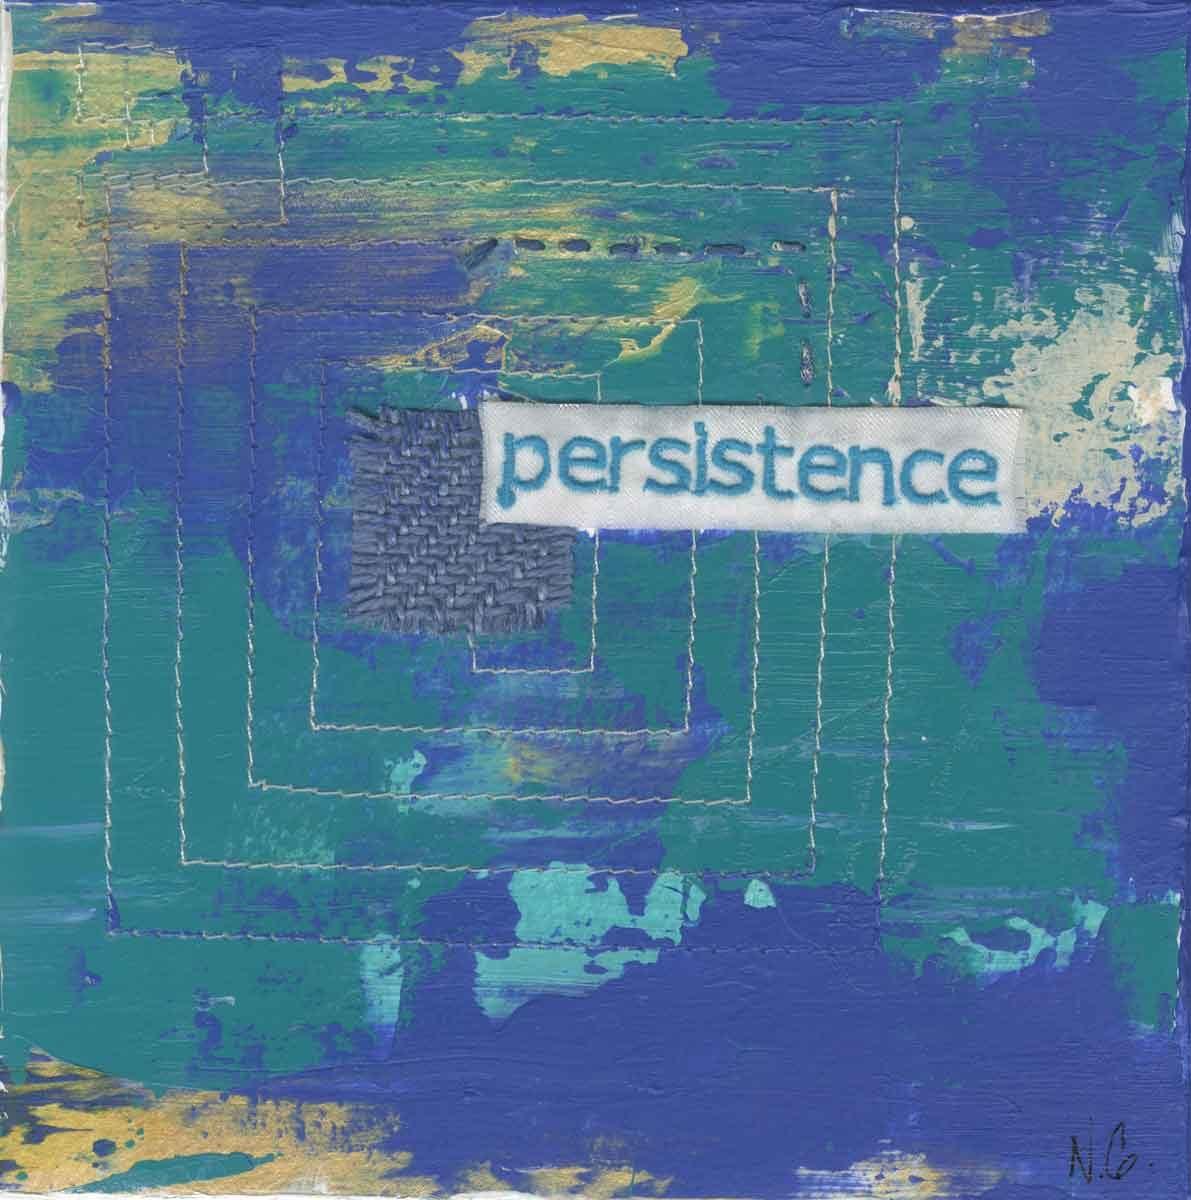 "persistence, 6"" x 6"" x ¾,"" Nan Genger, 2016"